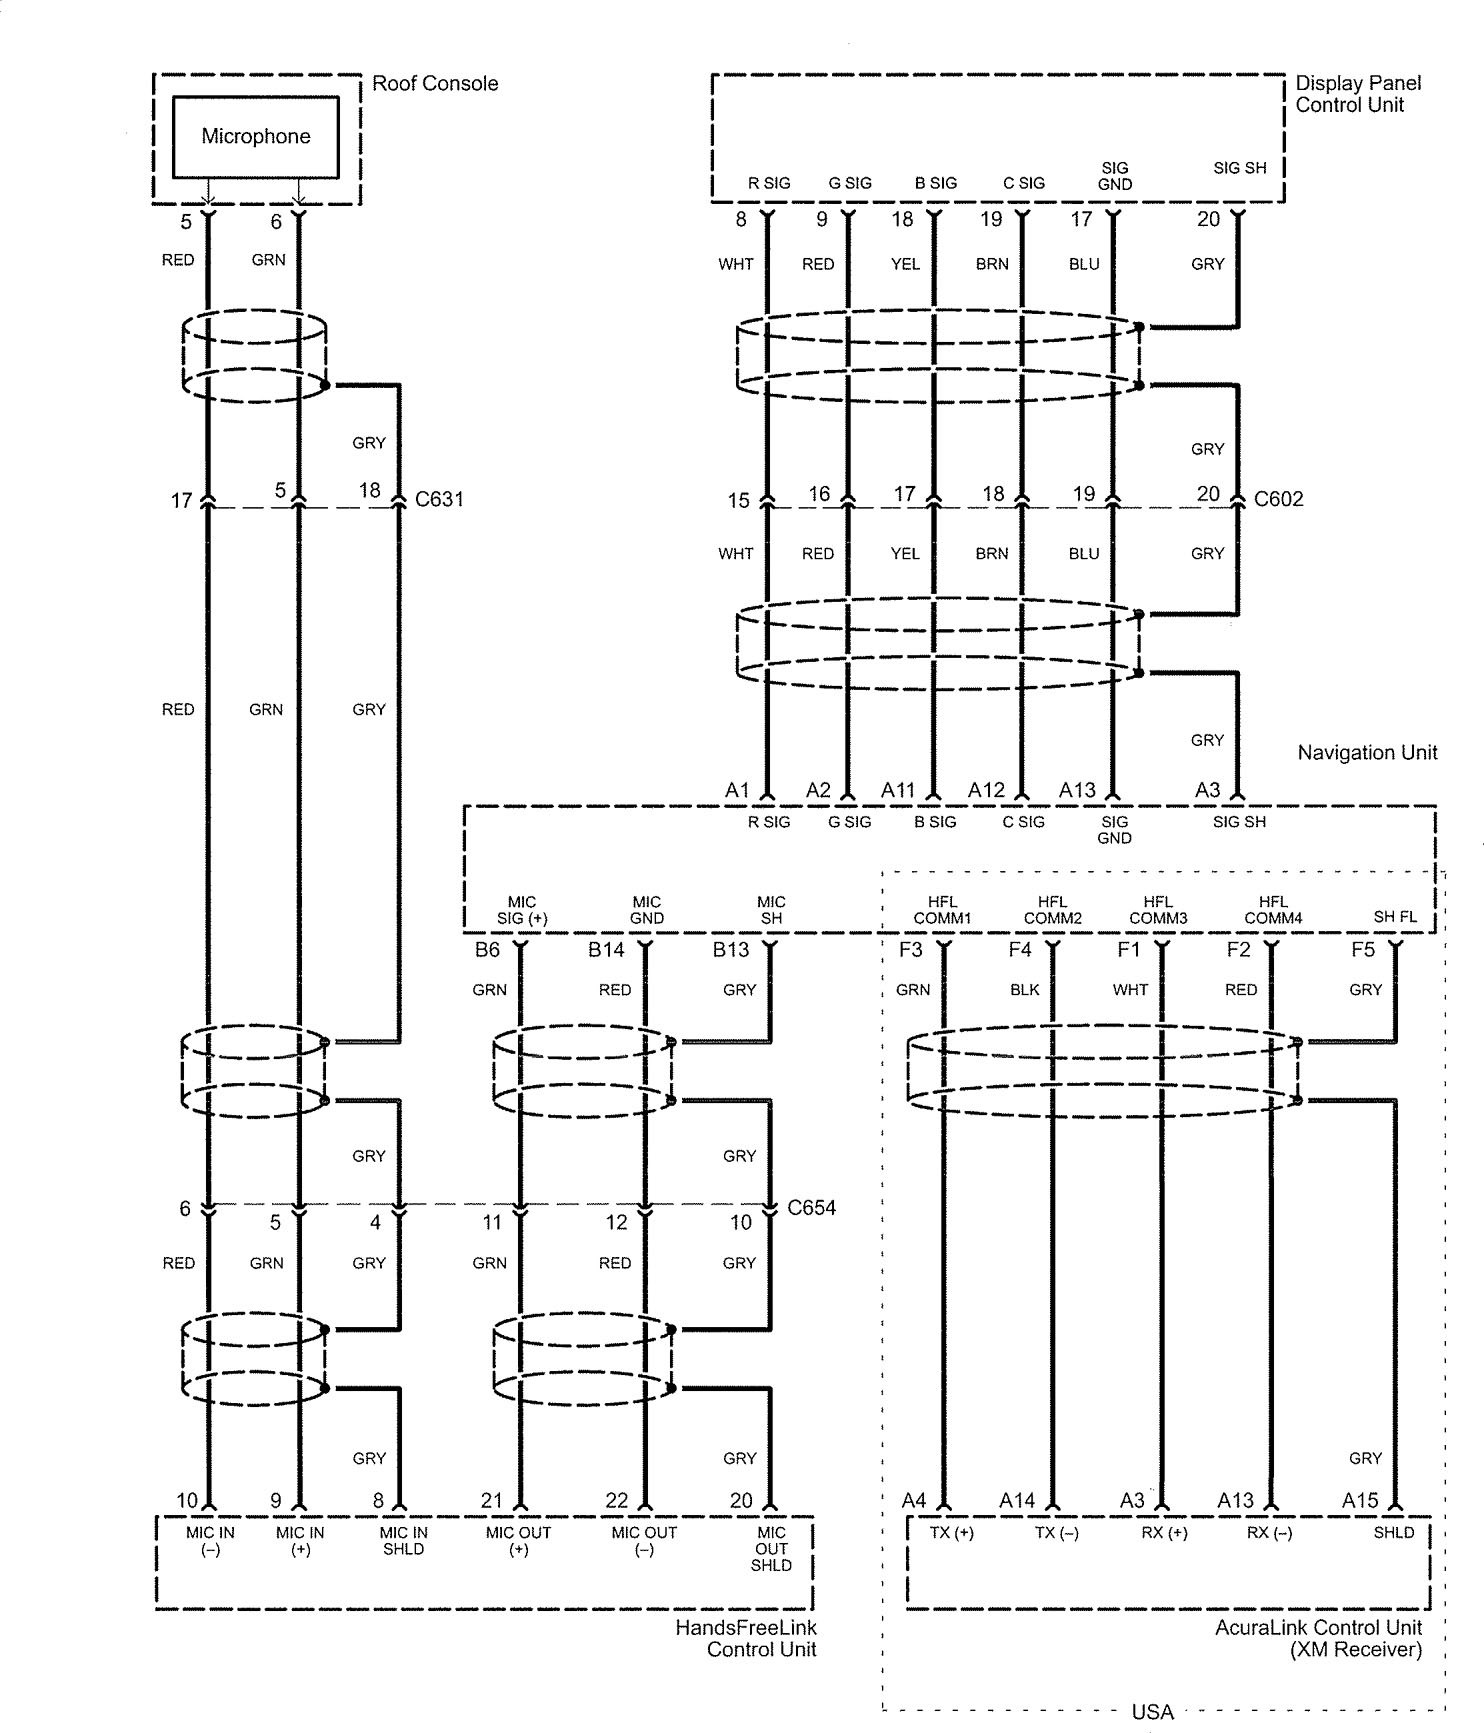 acura rl  2006  - wiring diagrams